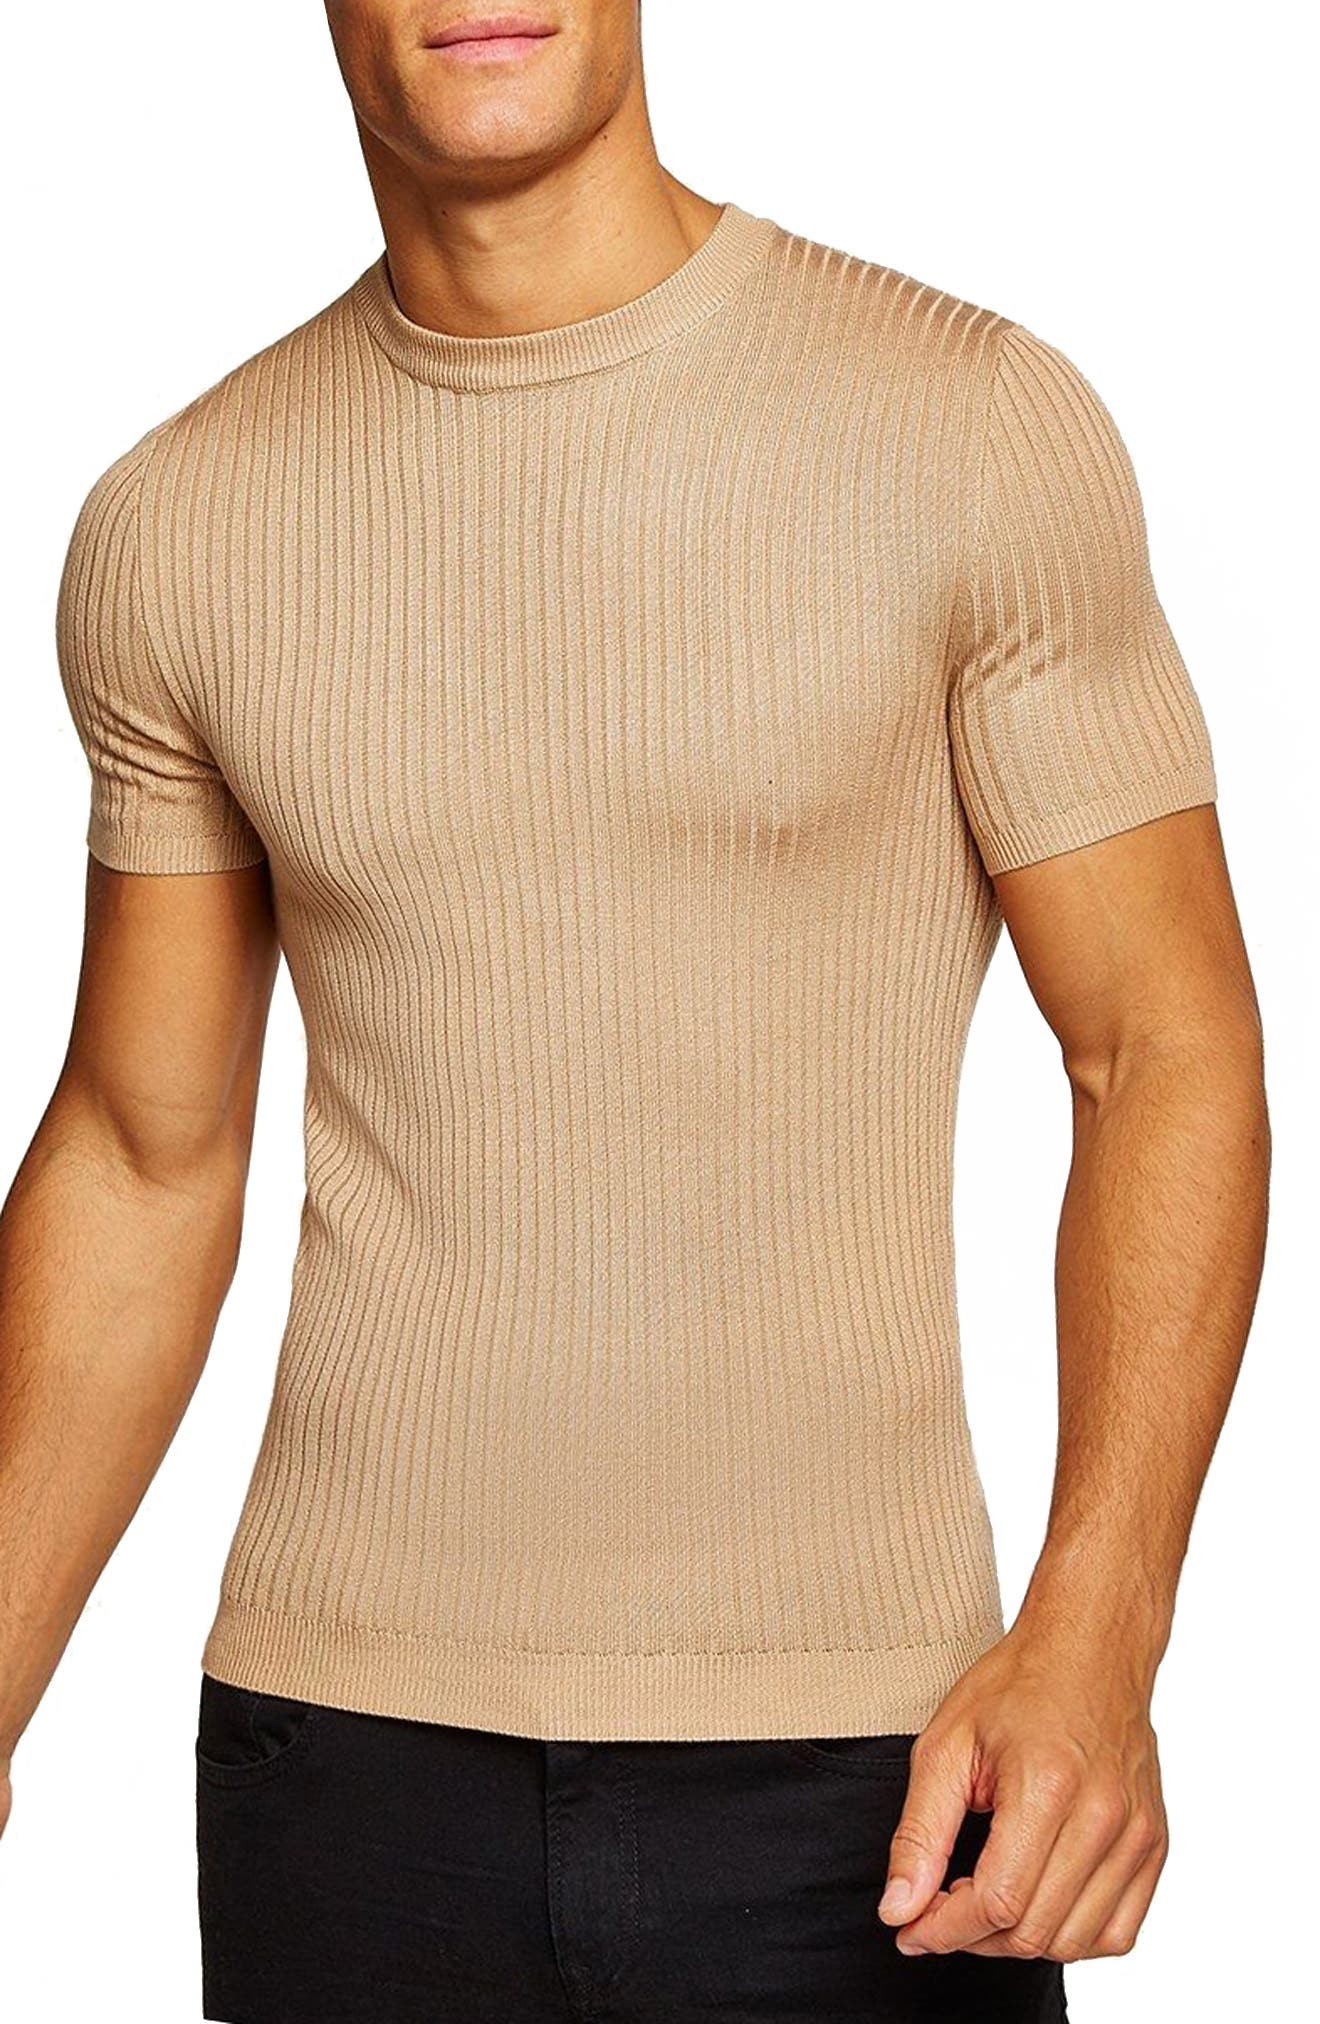 Short Sleeve Muscle Fit Shirt,                             Main thumbnail 1, color,                             250